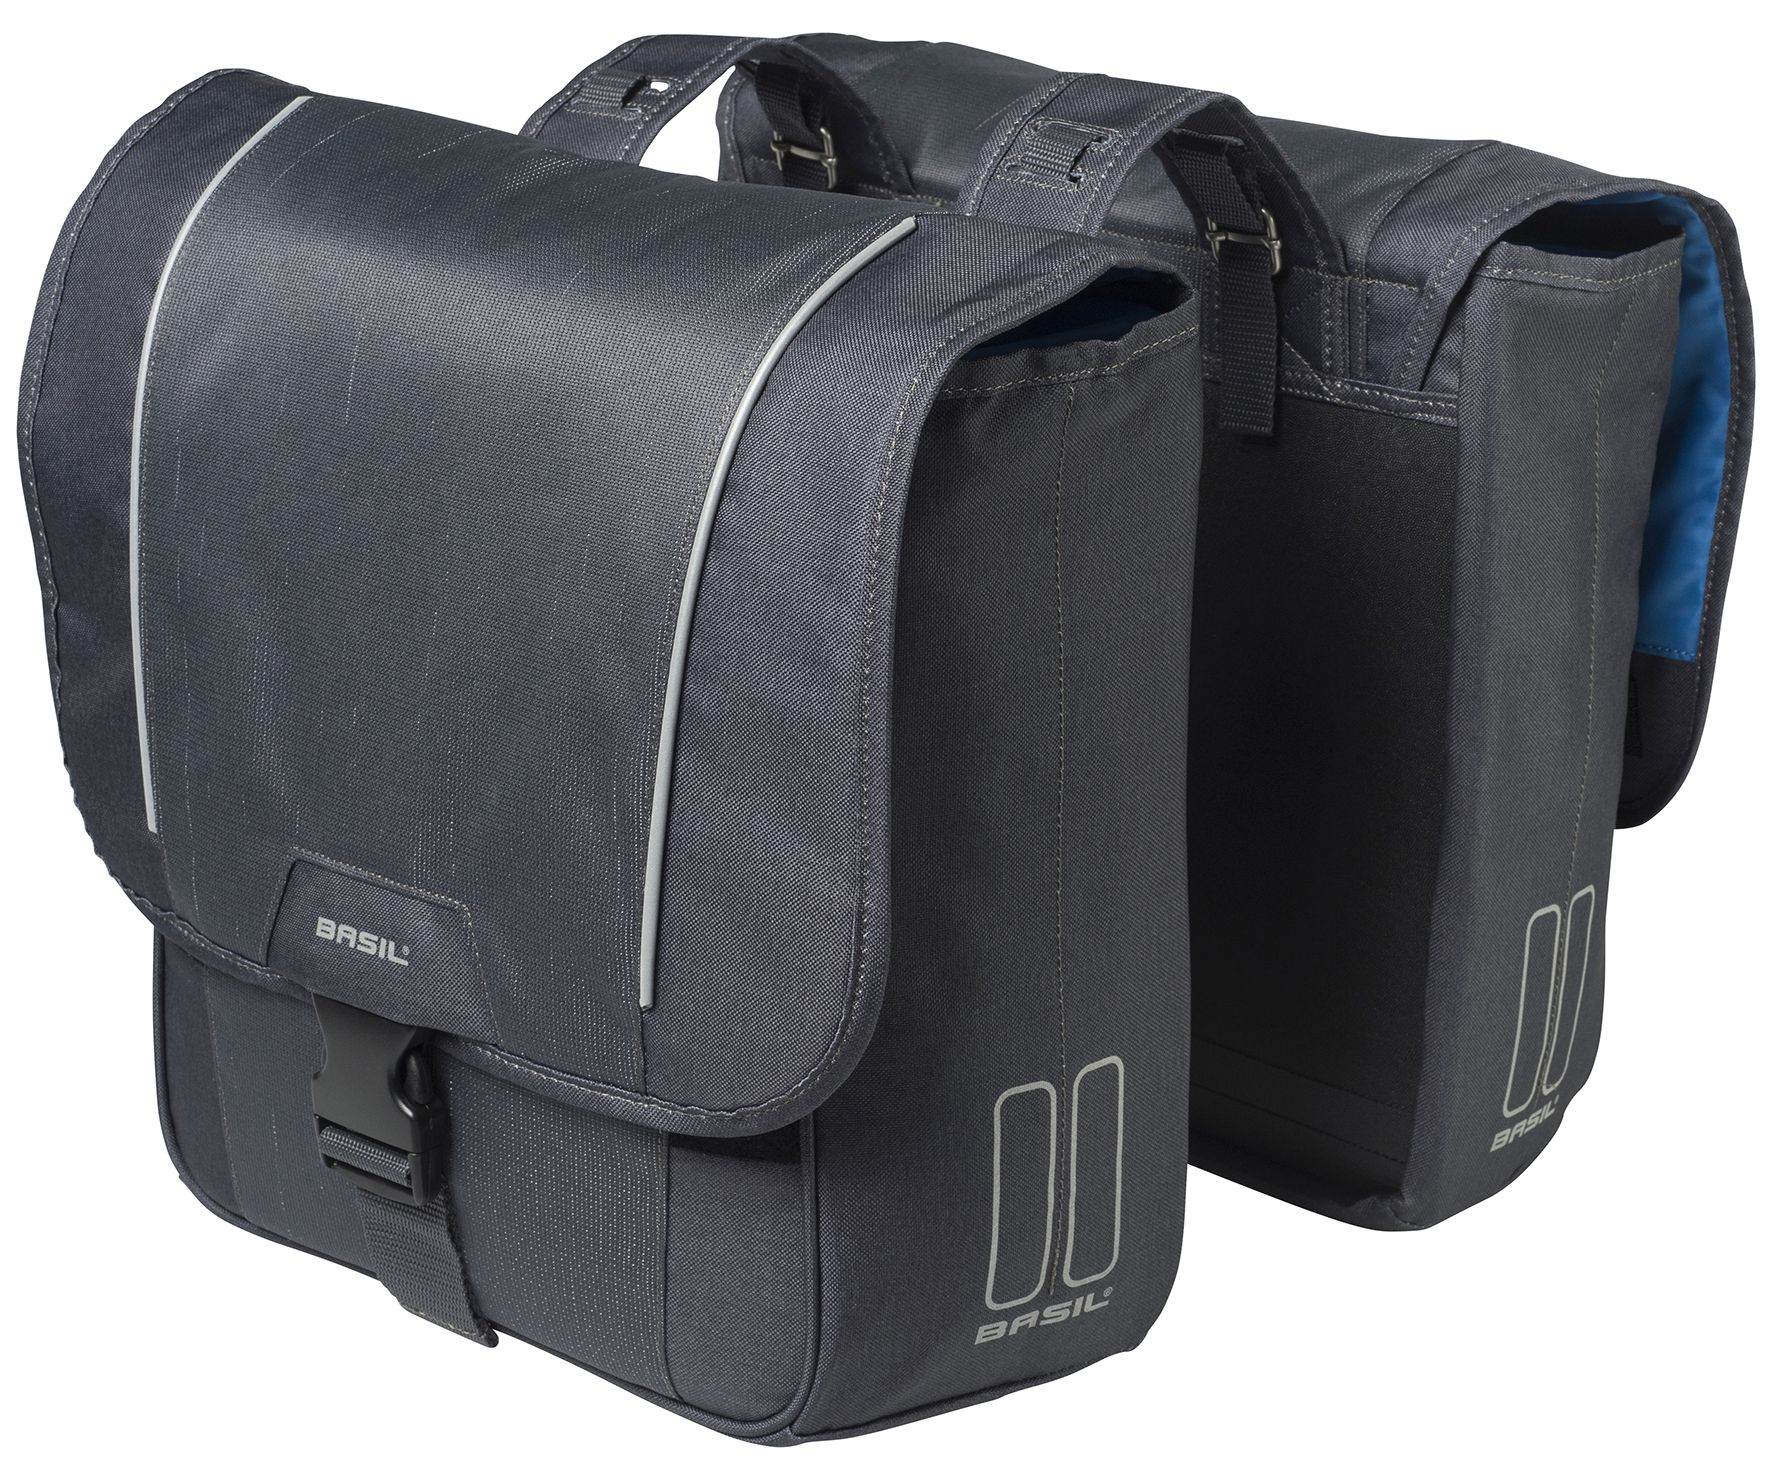 Basil Doppelpacktasche 34x13x42cm Sport Design Double Bag